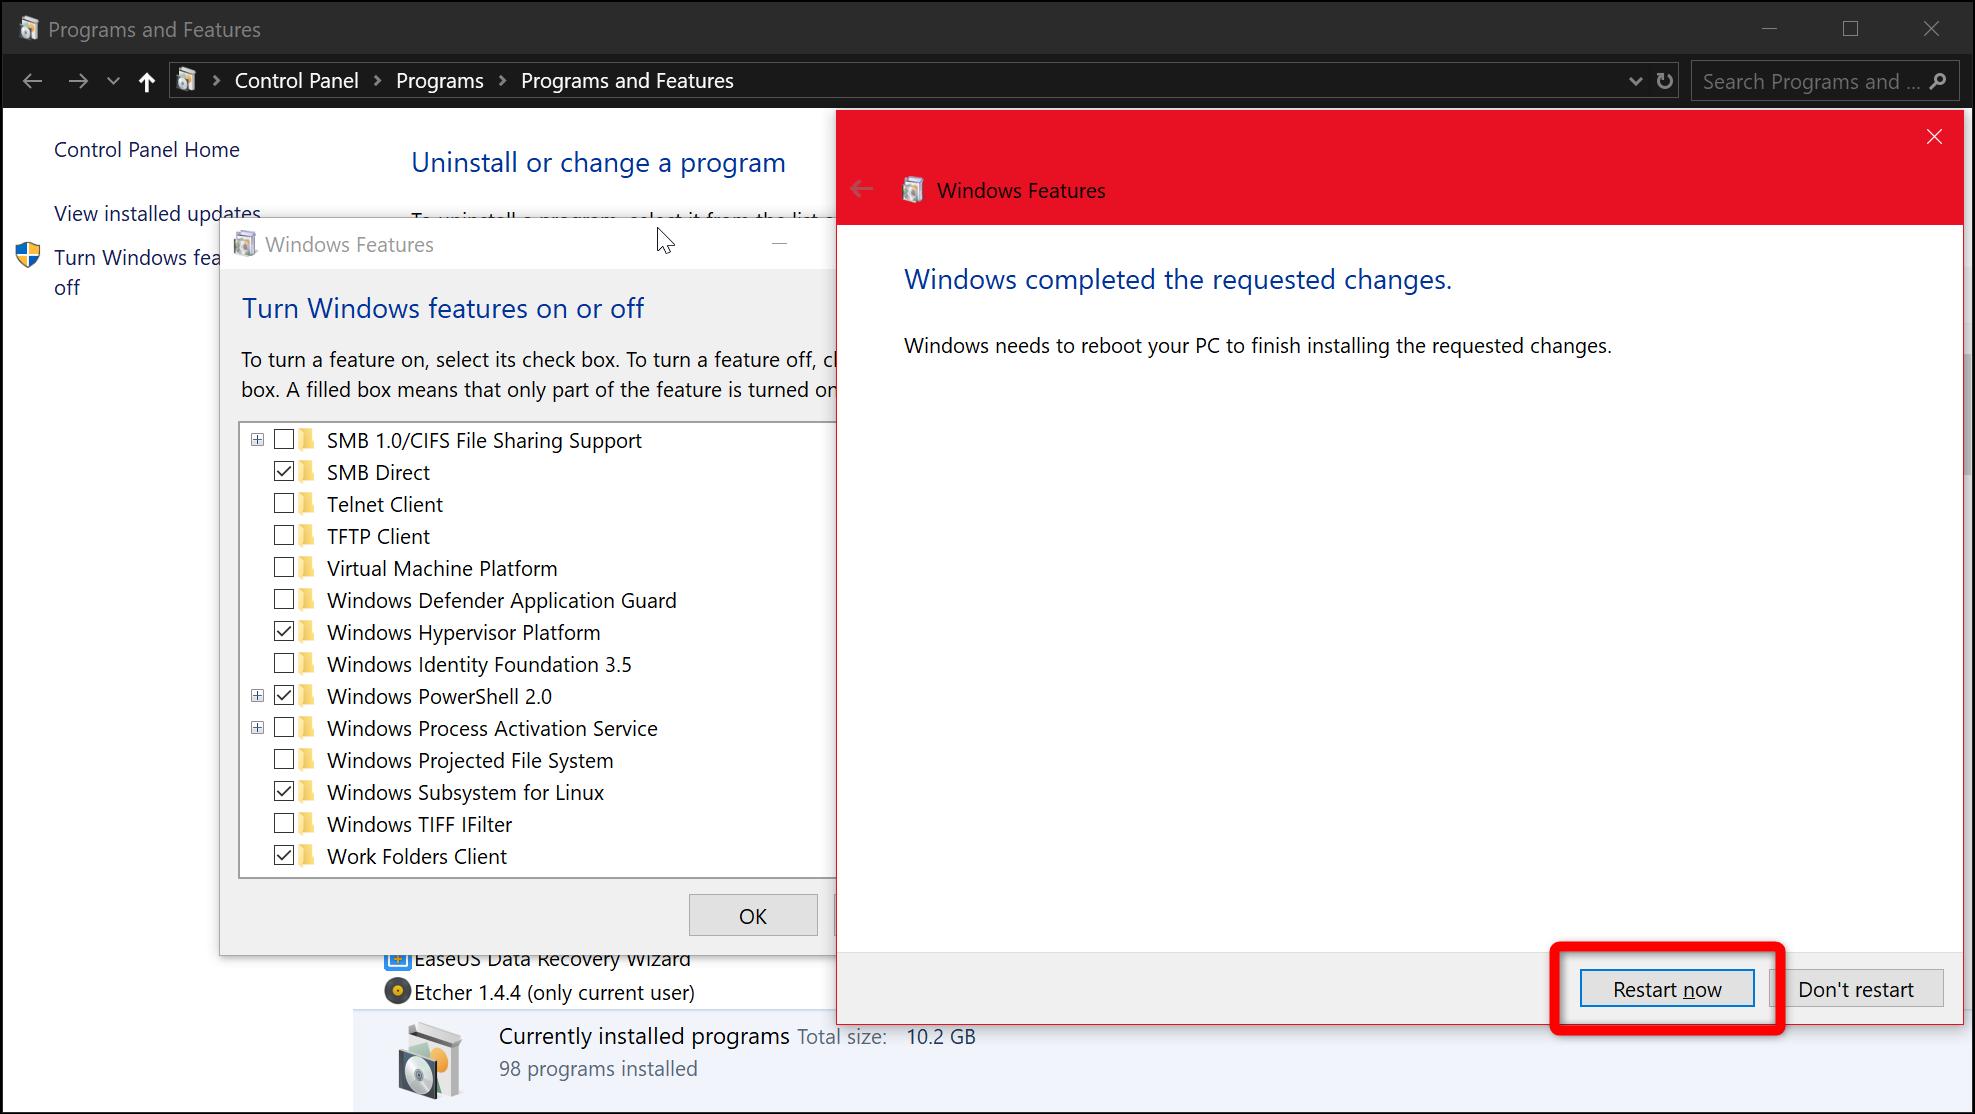 Setup environment for ESP32 + mruby/c development - WSL - HackMD